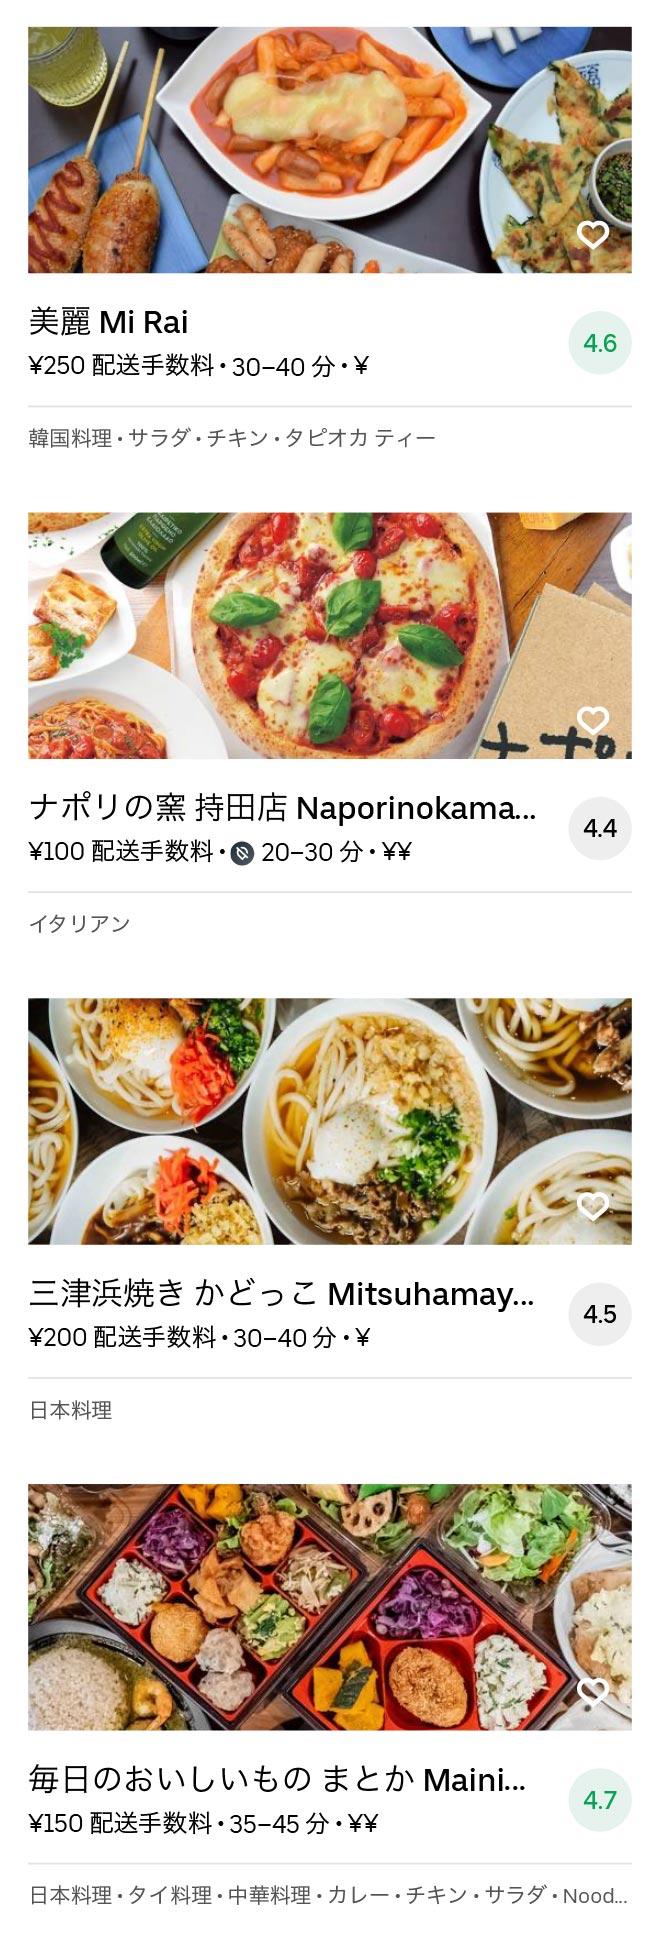 Kitakume menu 2010 05